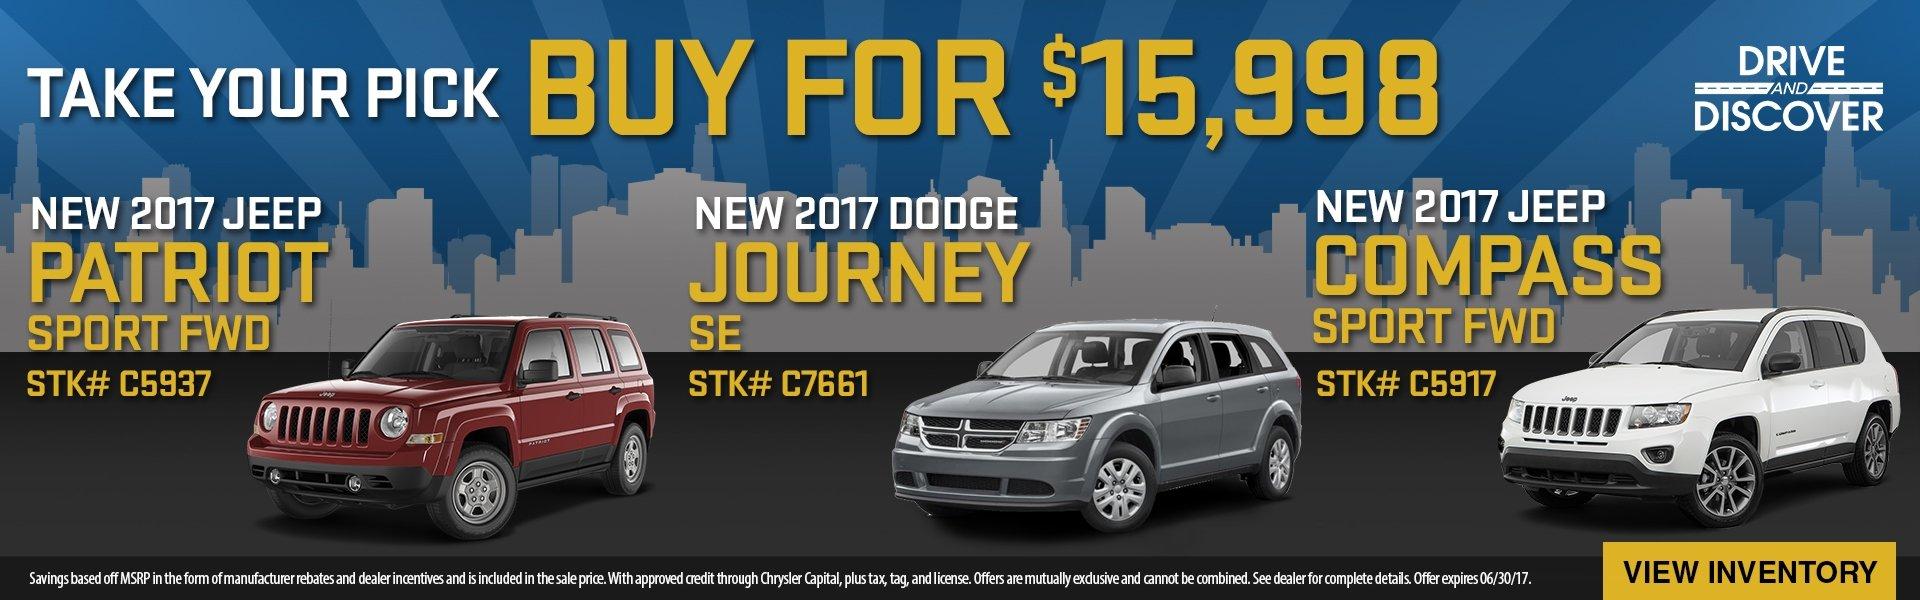 2017 Patriot, Journey or Compass, buy for $15,998! See dealer for details